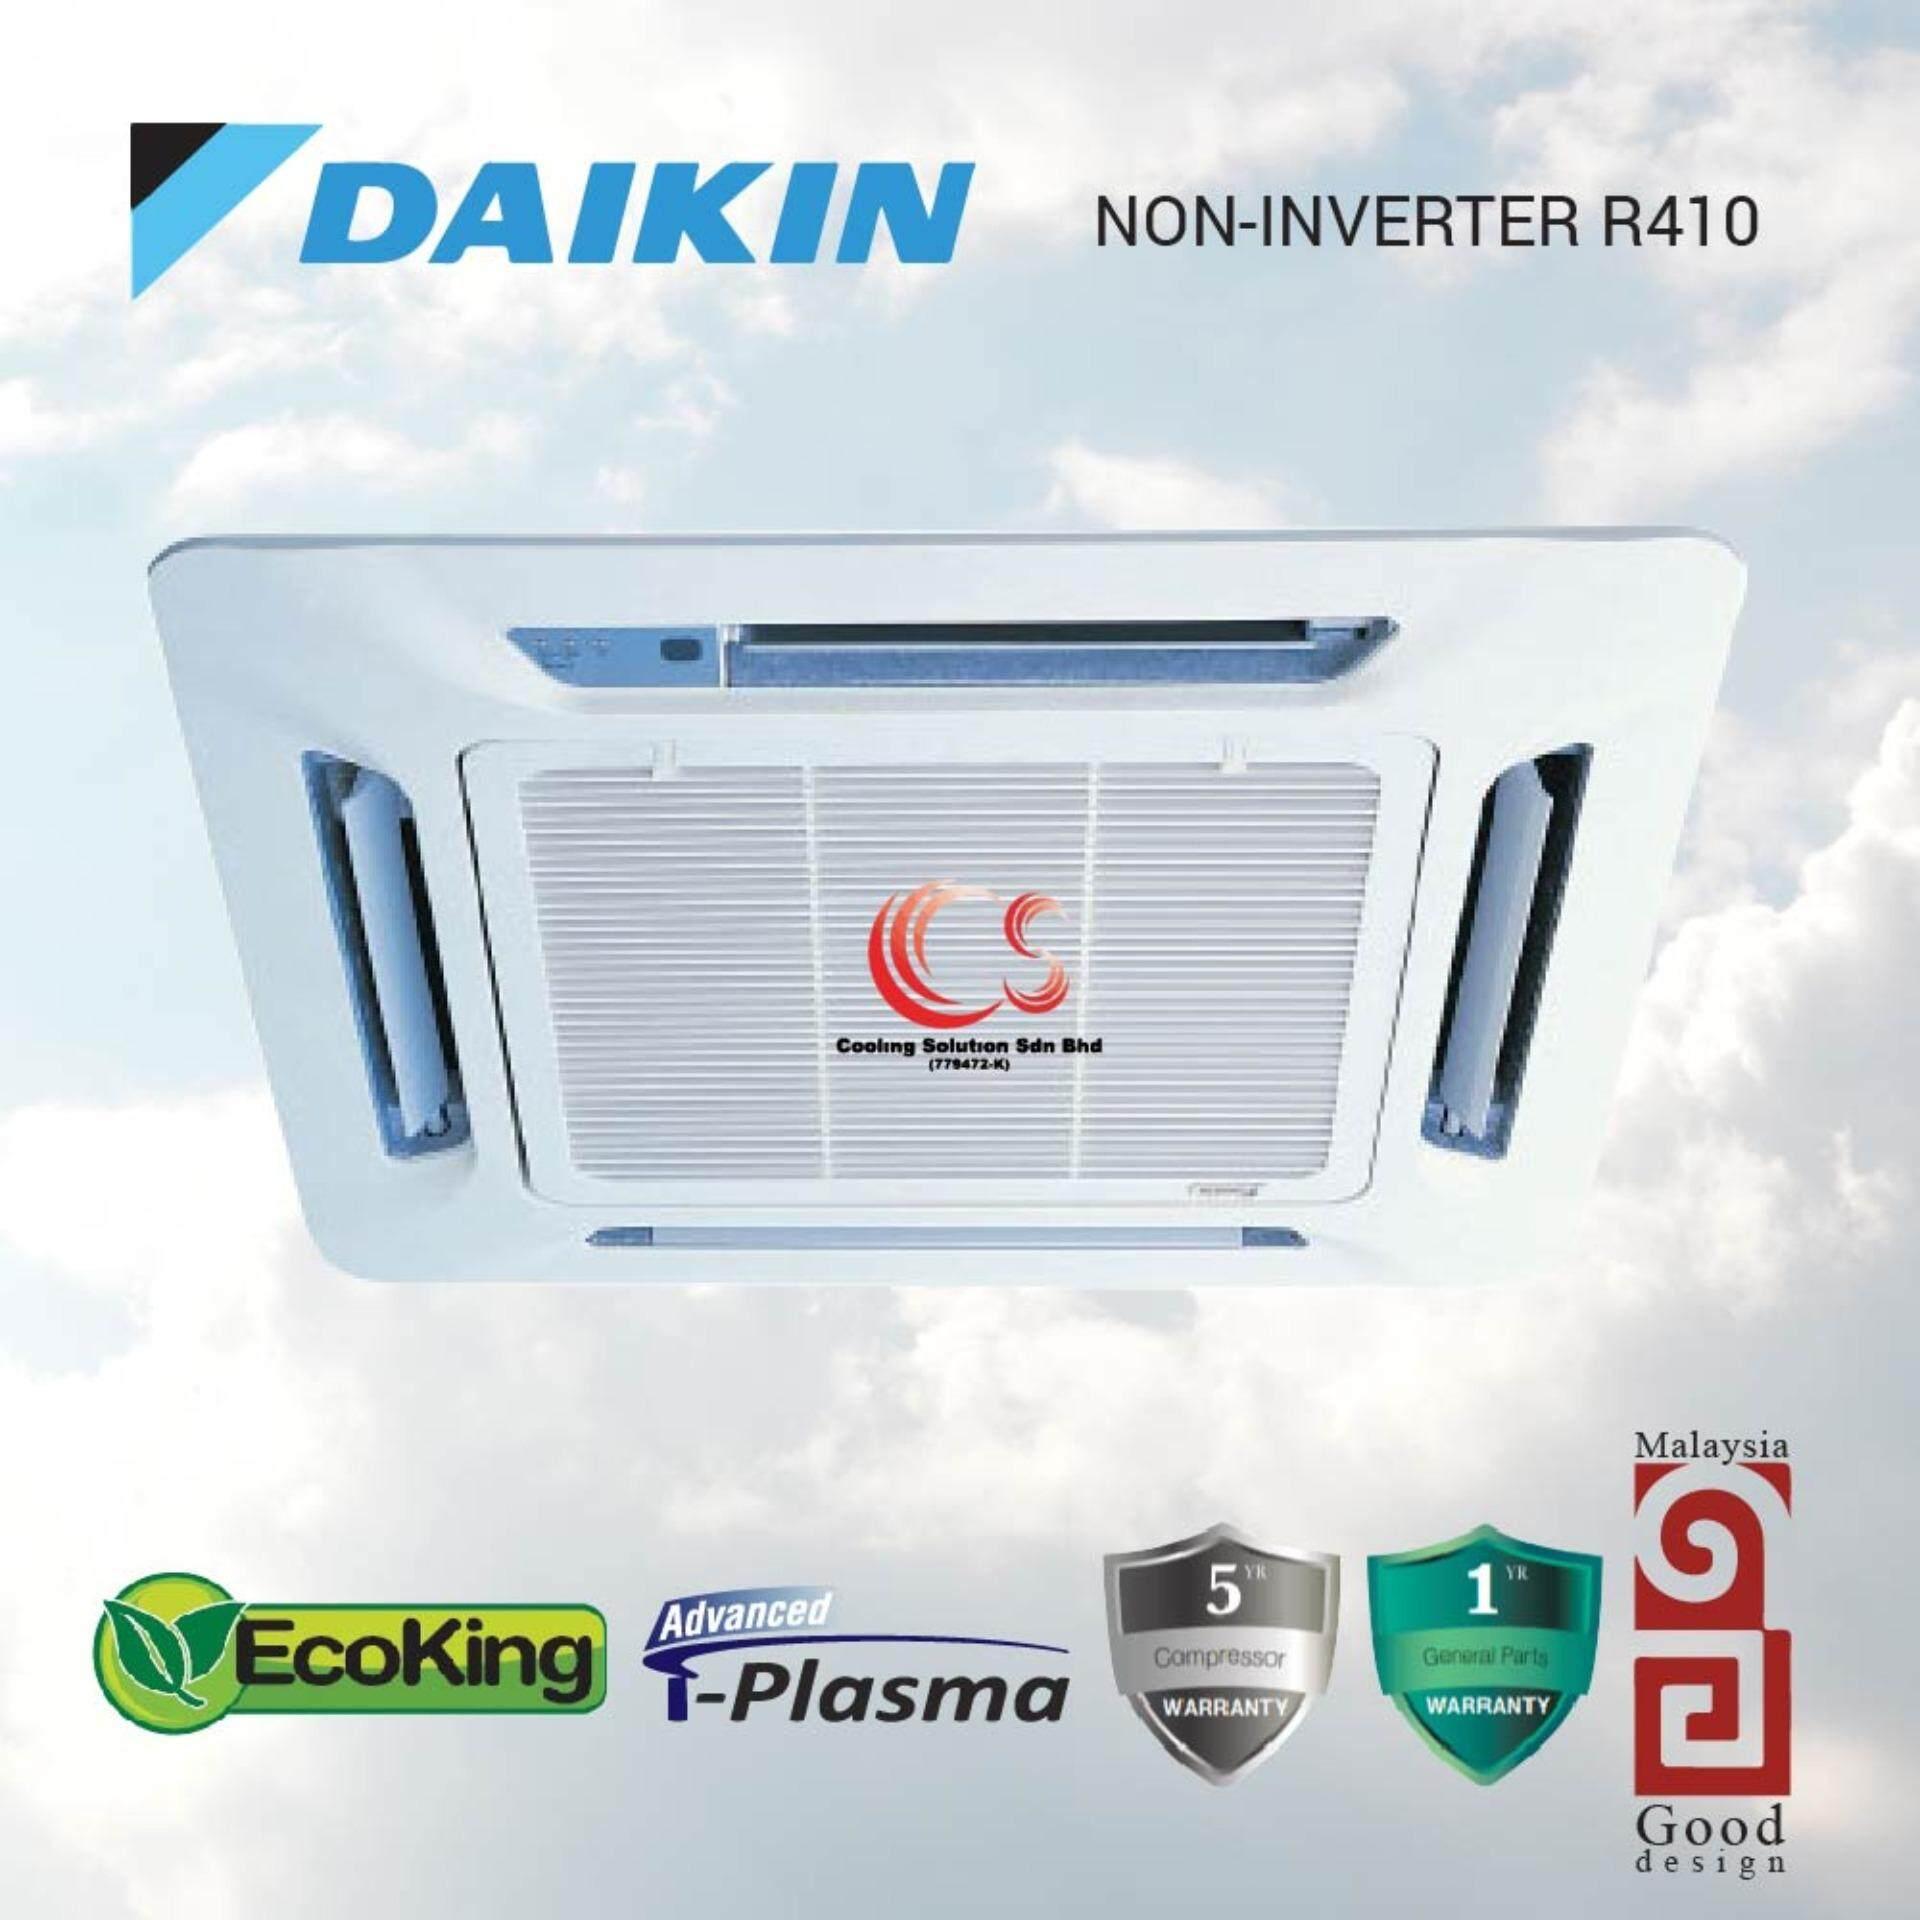 DAIKIN CASSETTE NON INVERTER BASIC R410 FFN15C/RN15F